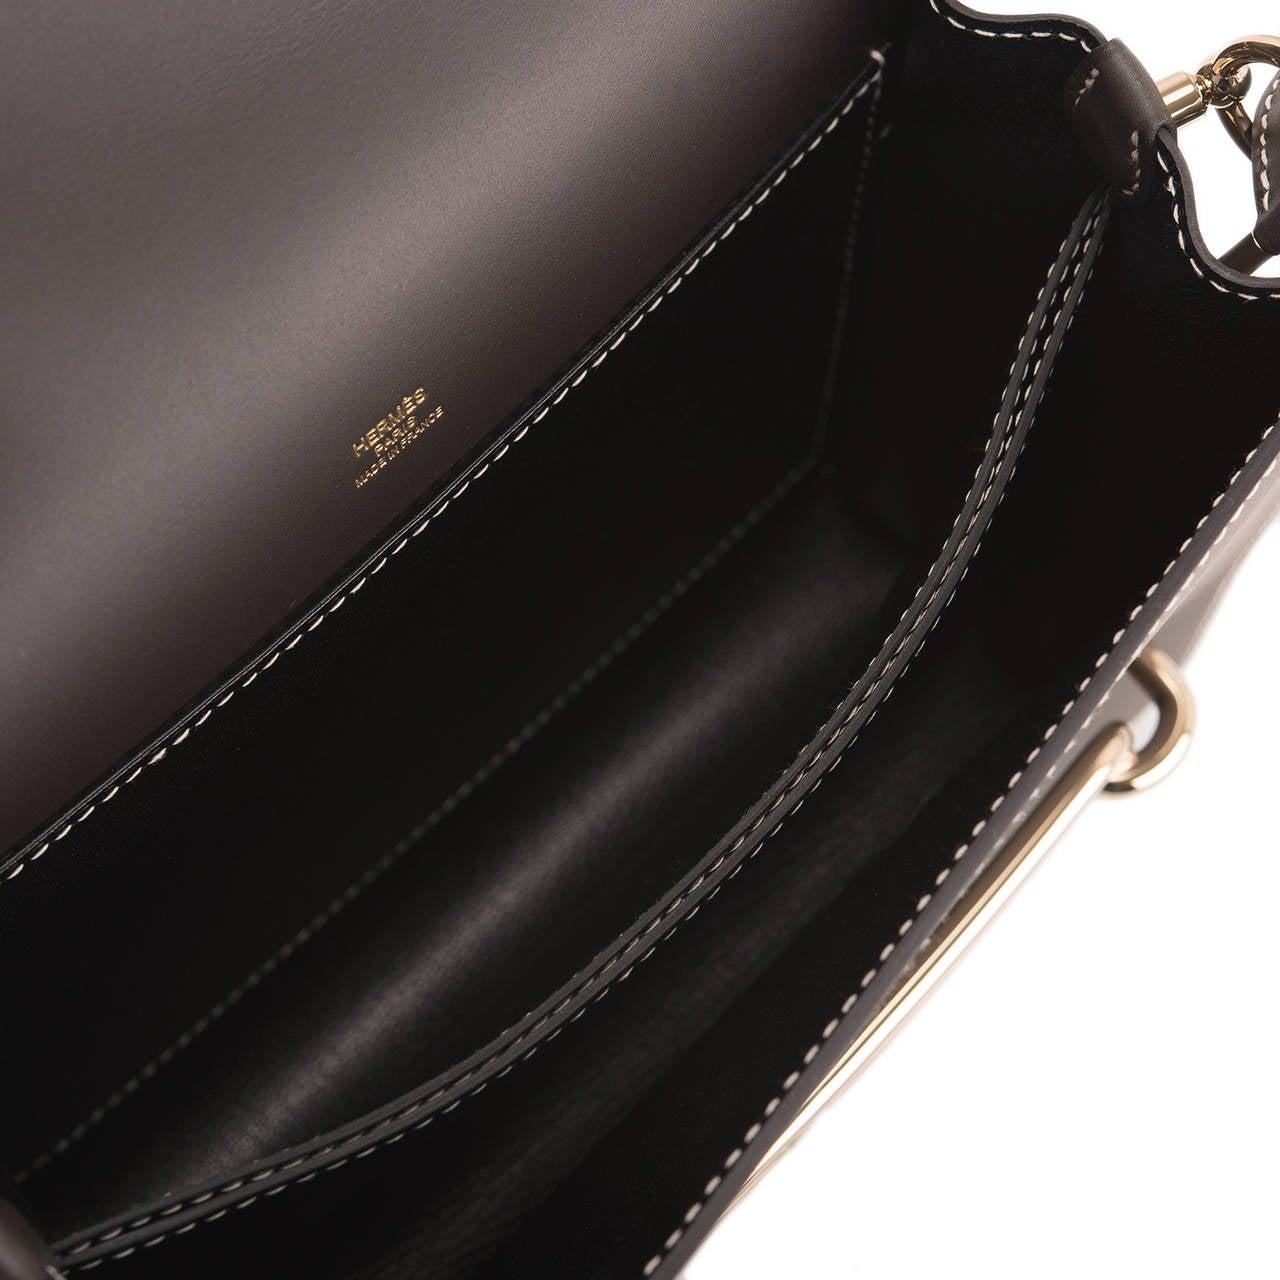 usl briefcase hermes - hermes bolide small fire orange